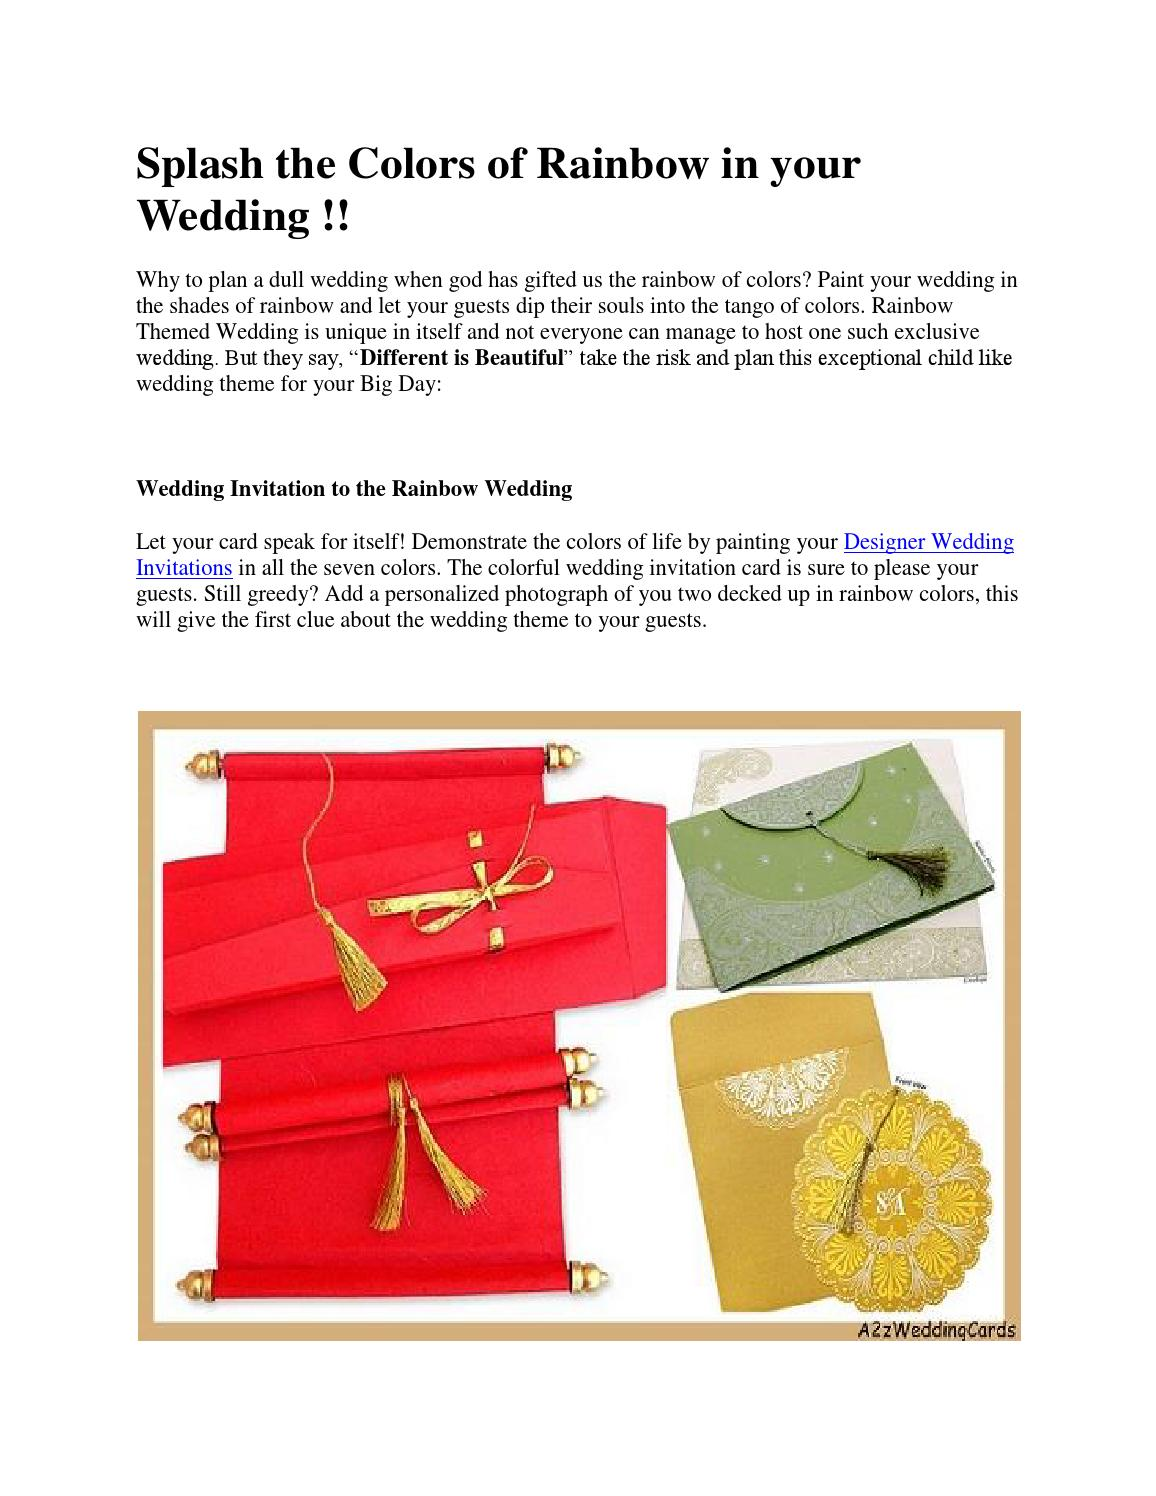 Splash The Colors Of Rainbow In Your Wedding By A2zweddingcards Issuu